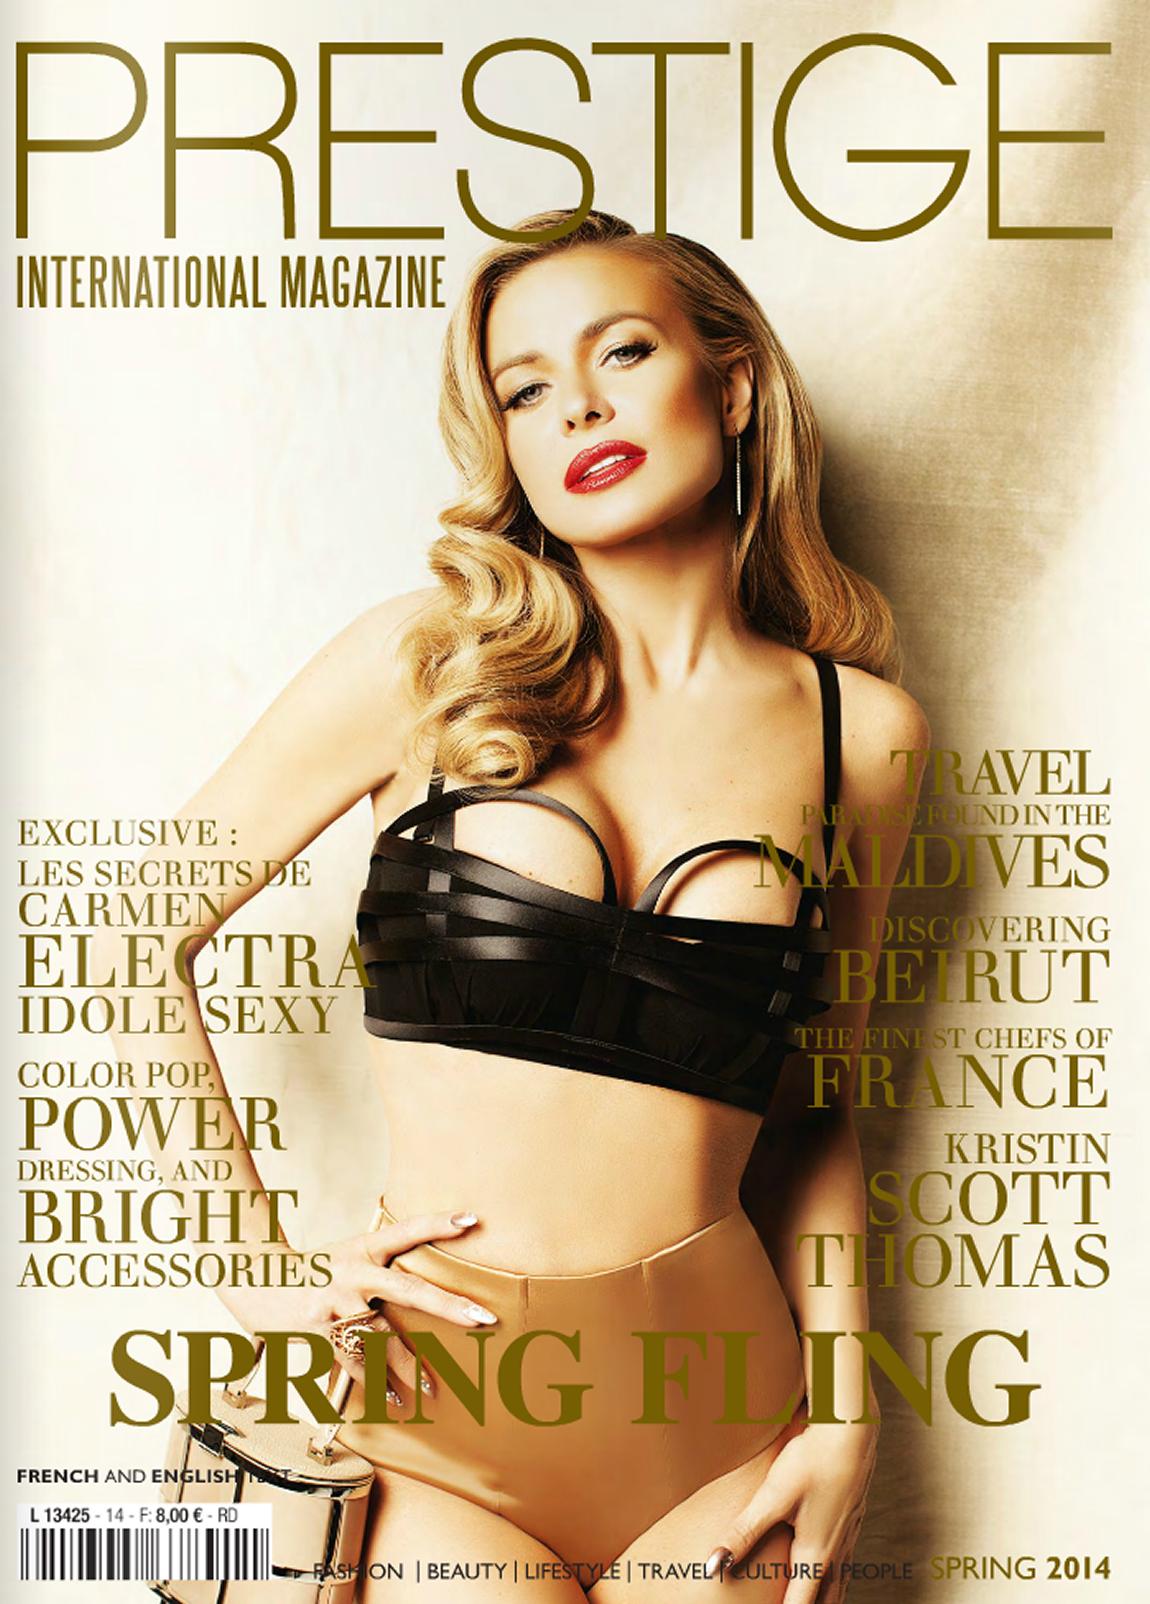 Translation of the magazine Prestige International